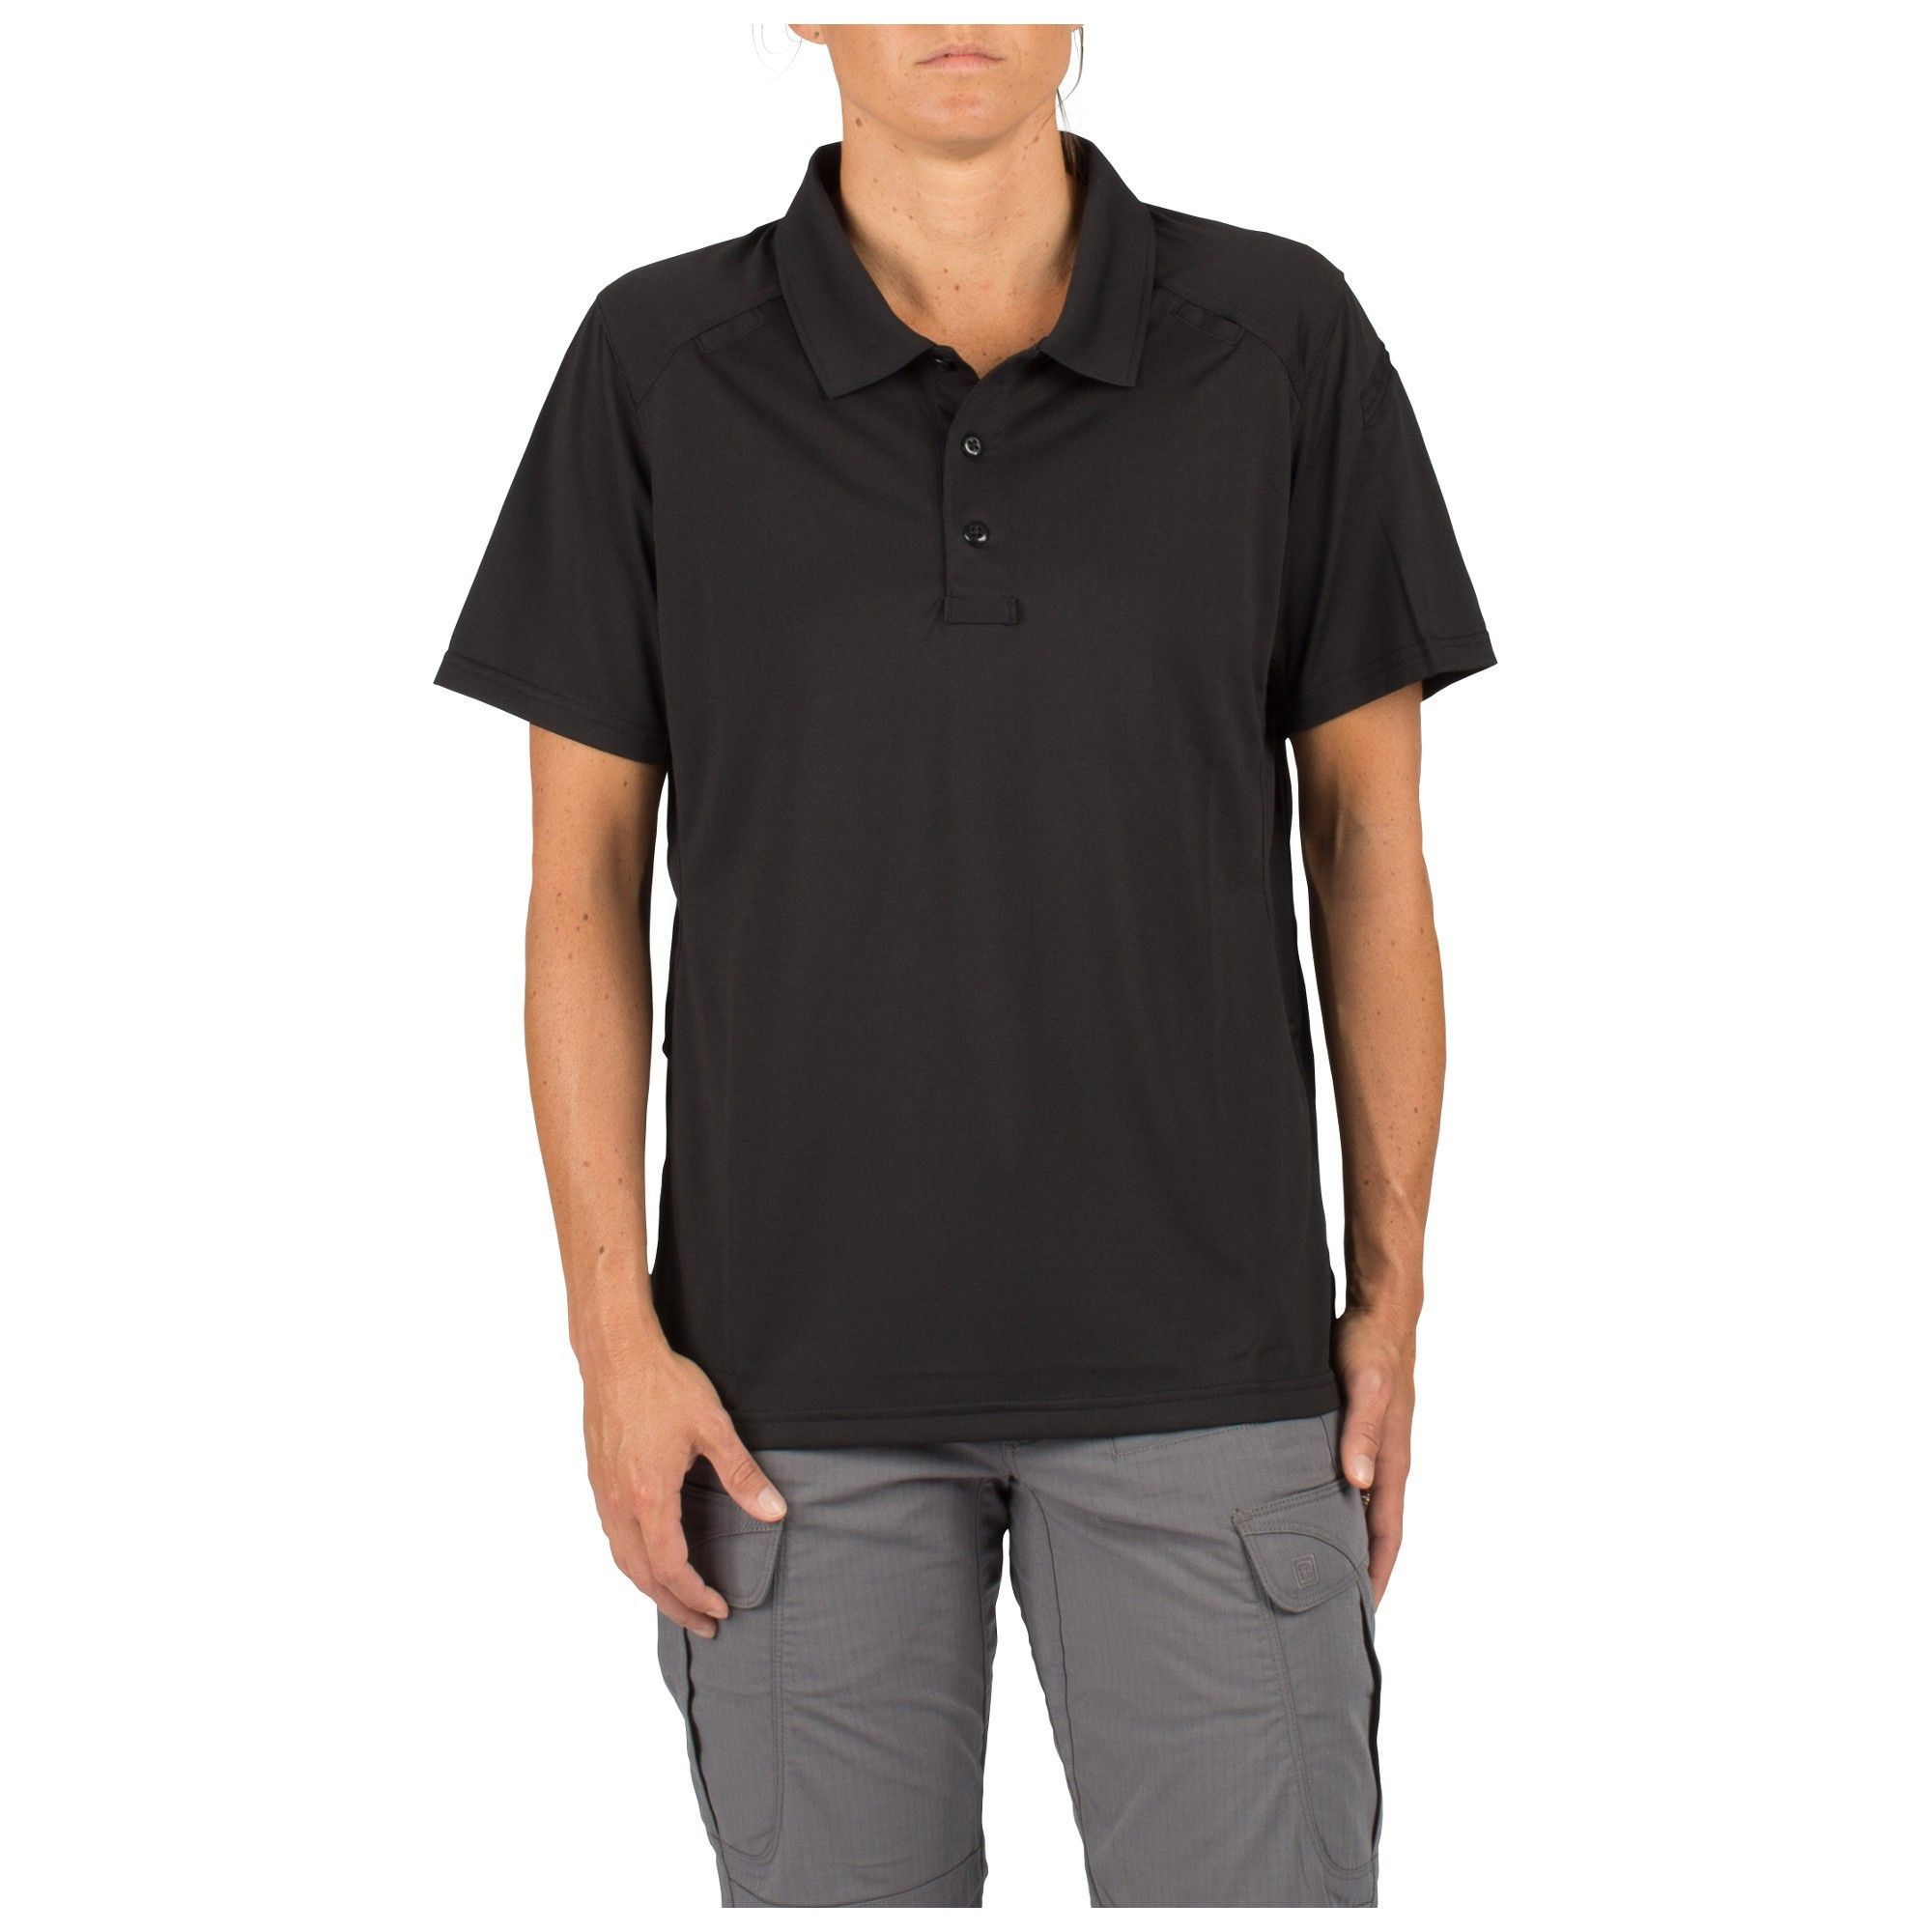 5.11 Women's Helios Short Sleeve Polo